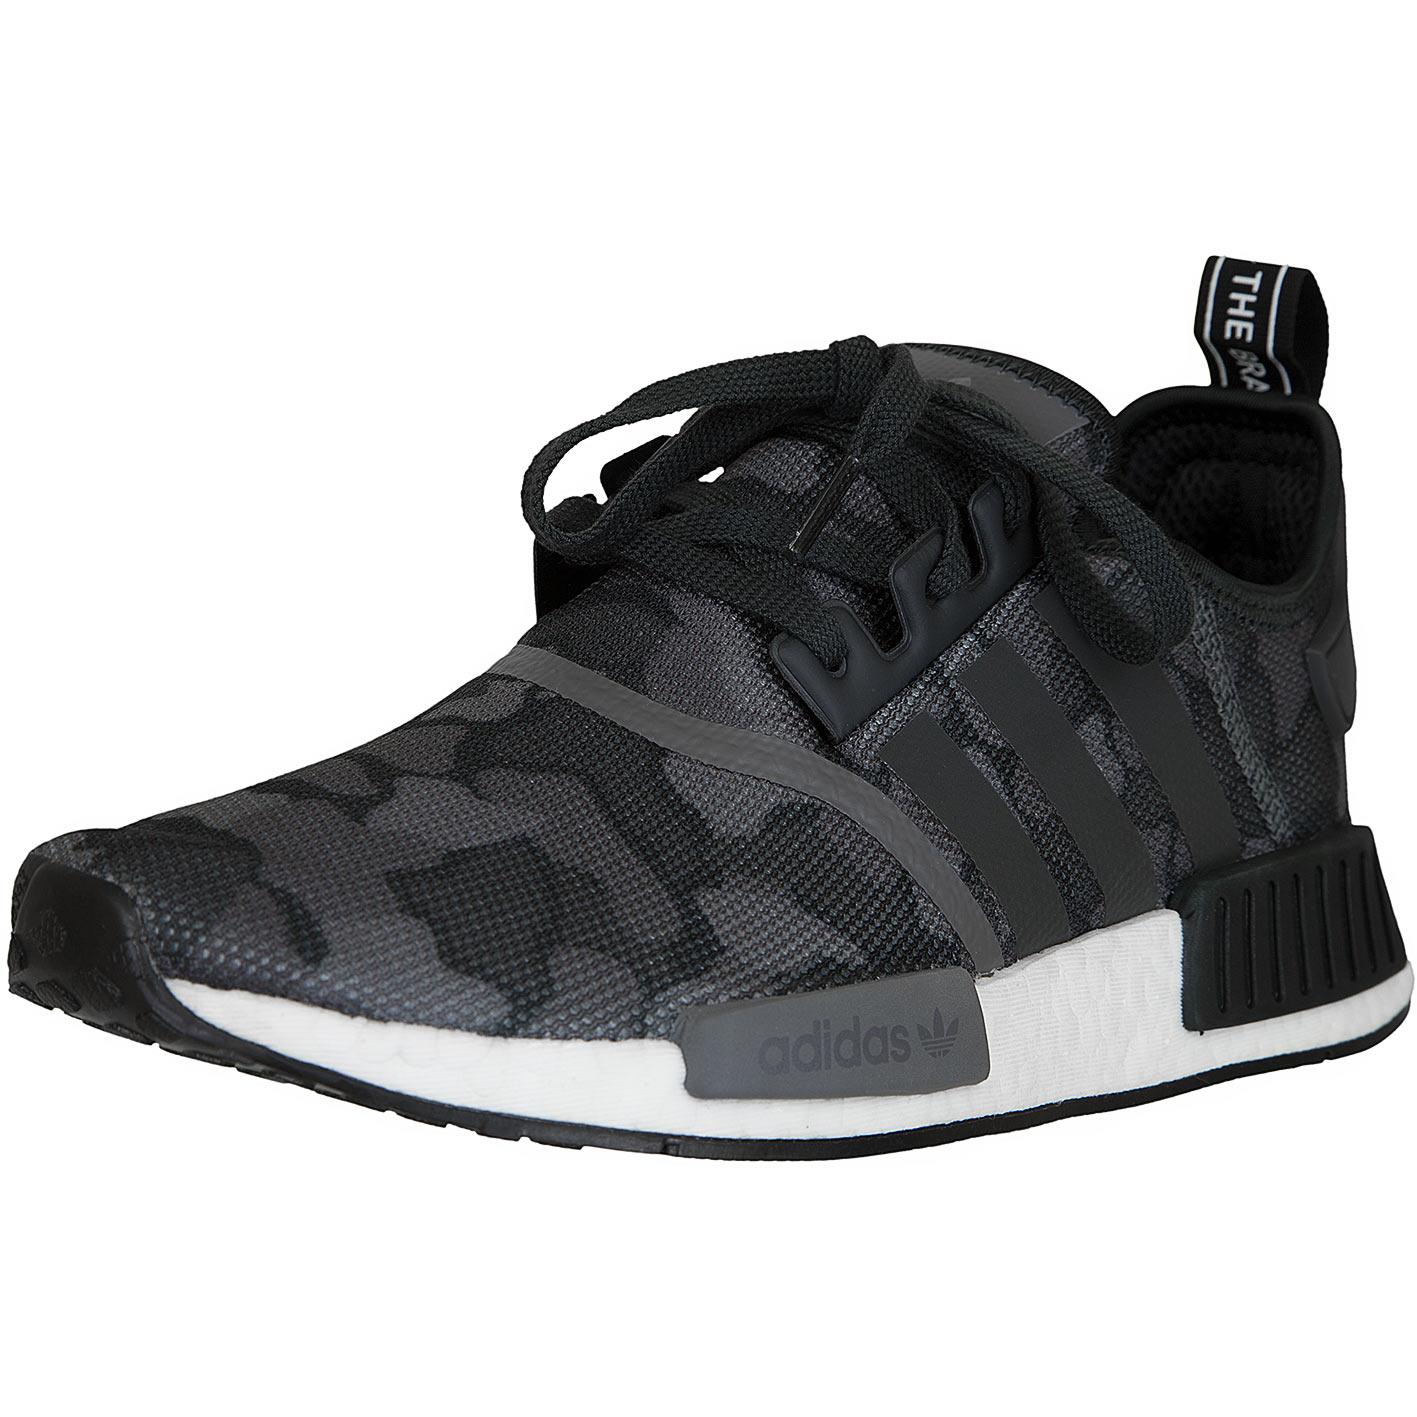 ? Adidas Originals Sneaker NMD R1 schwarzgrau hier